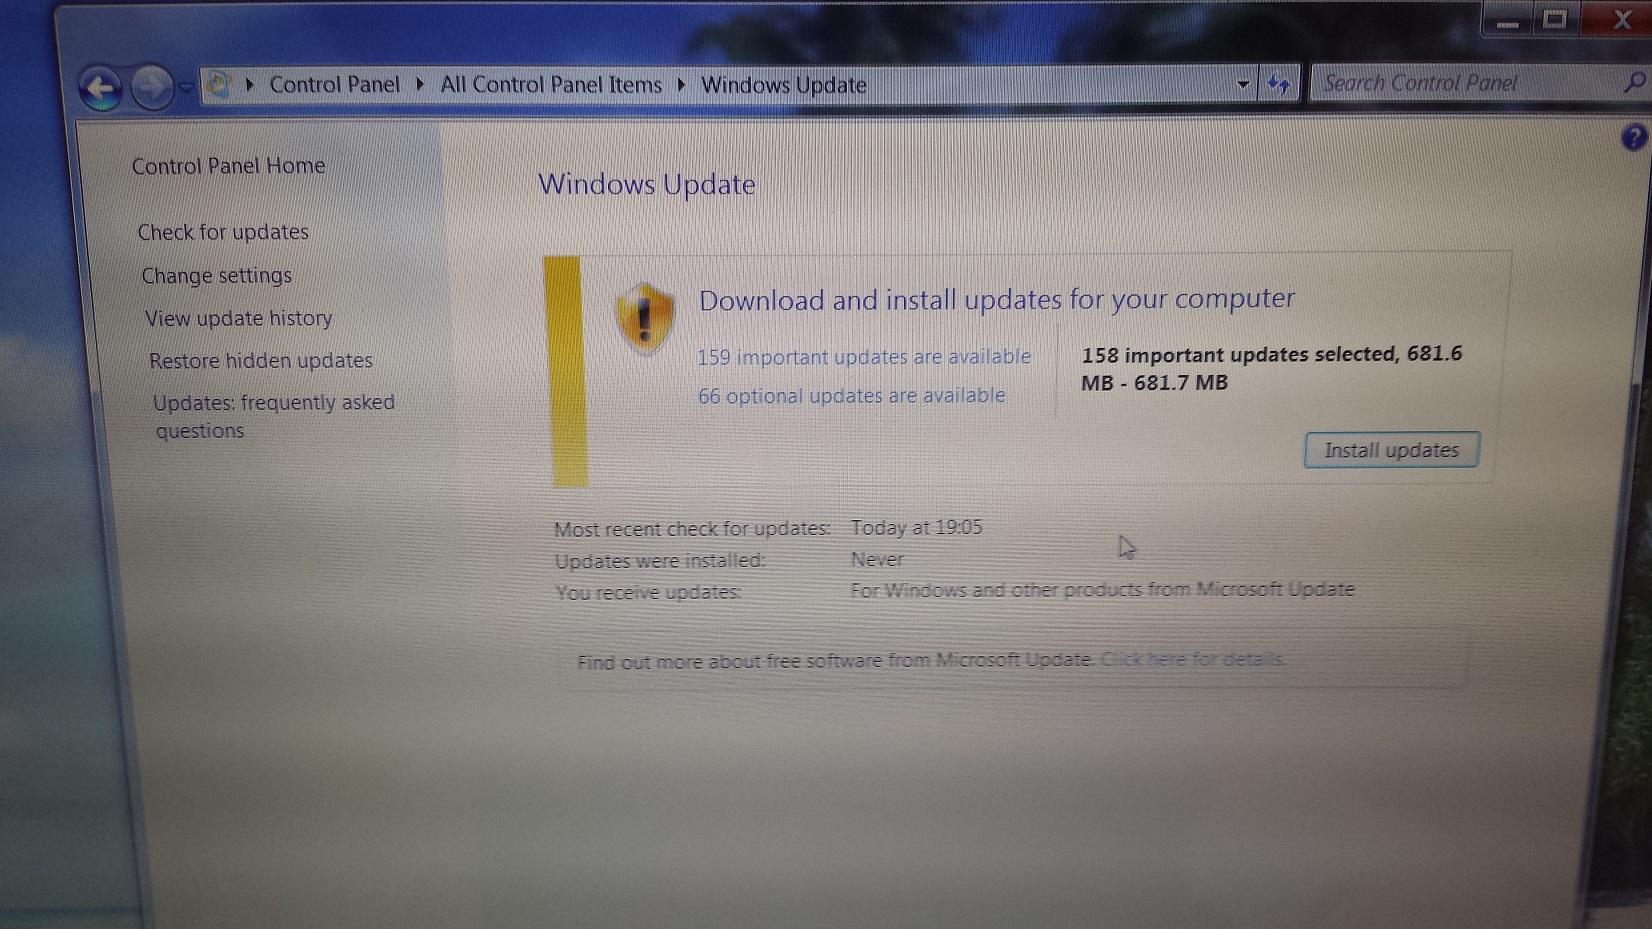 Windows update service start parameter changes every time I reboot 20160416_190650-jpg.jpg